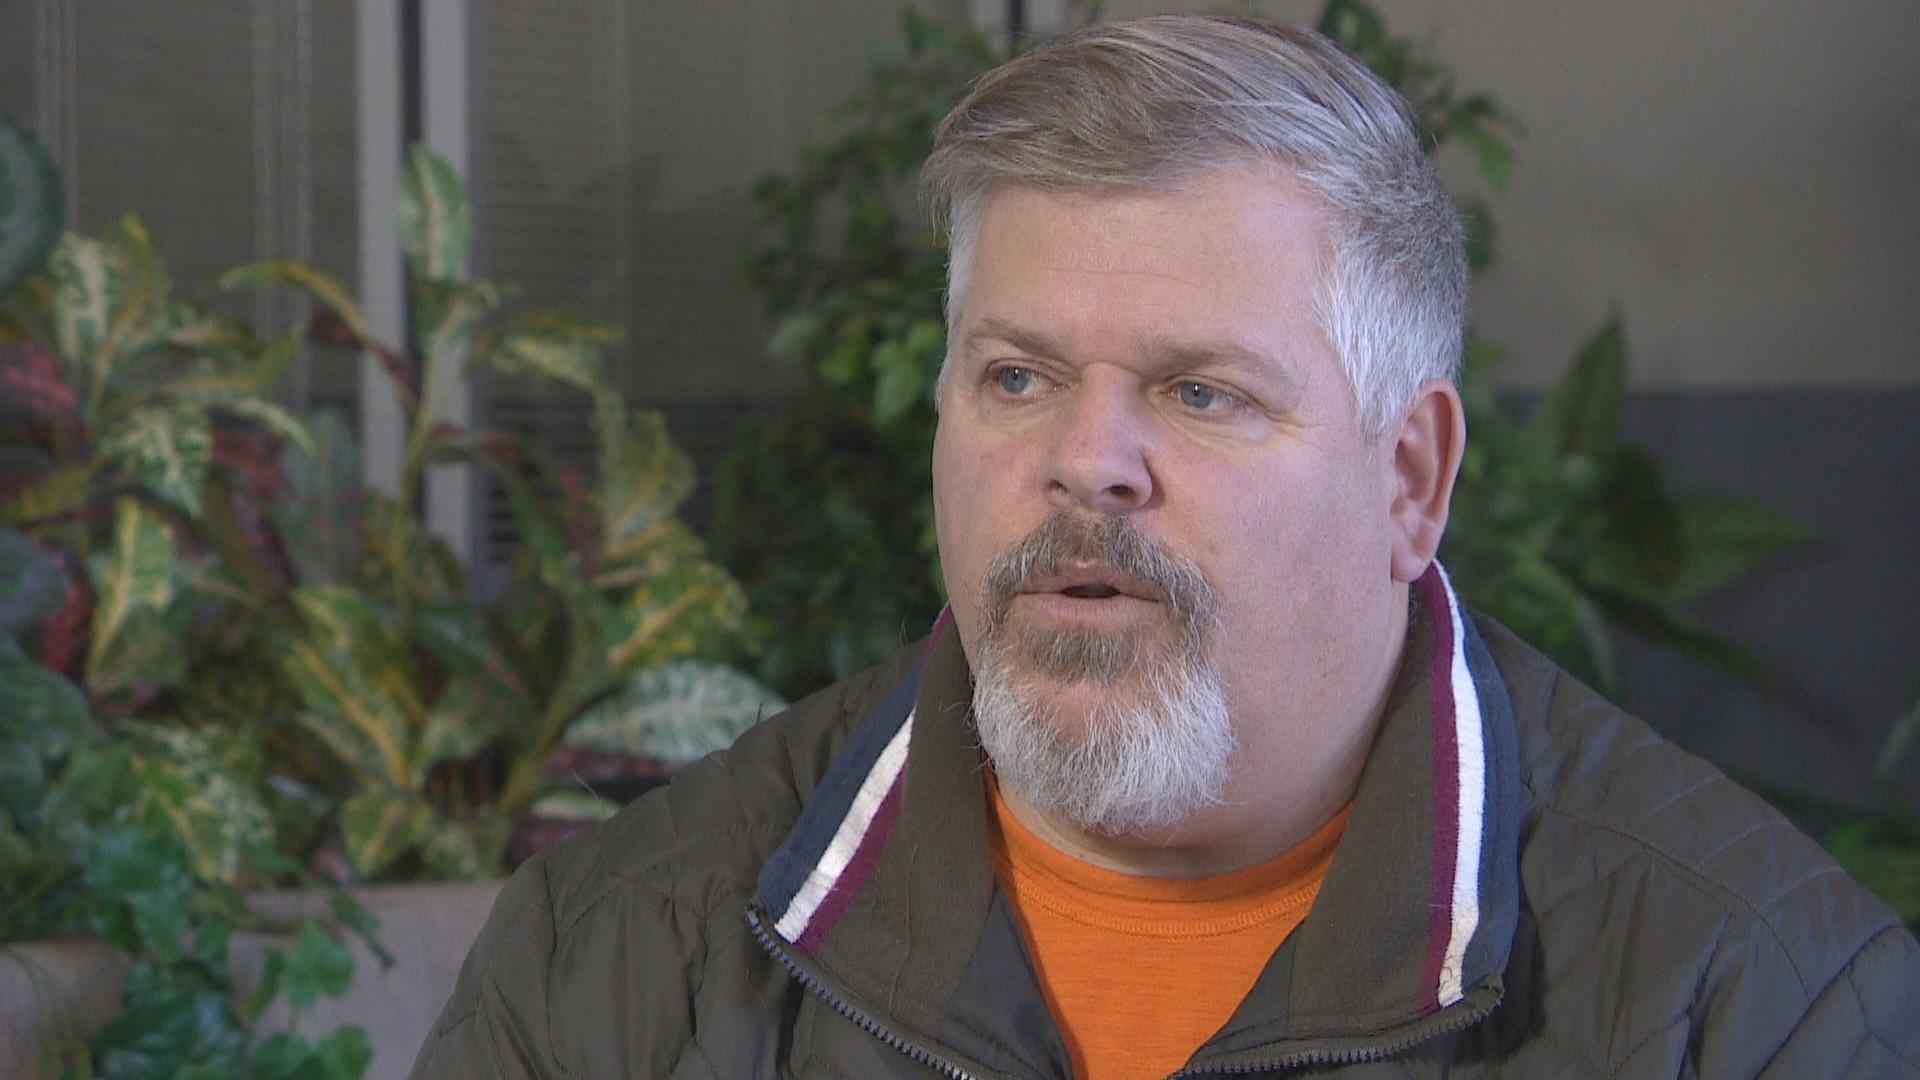 Curtis Kemp used to conduct online sexual exploitation investigations for the Regina Police Service. (Aldo Columpsi/CBC)